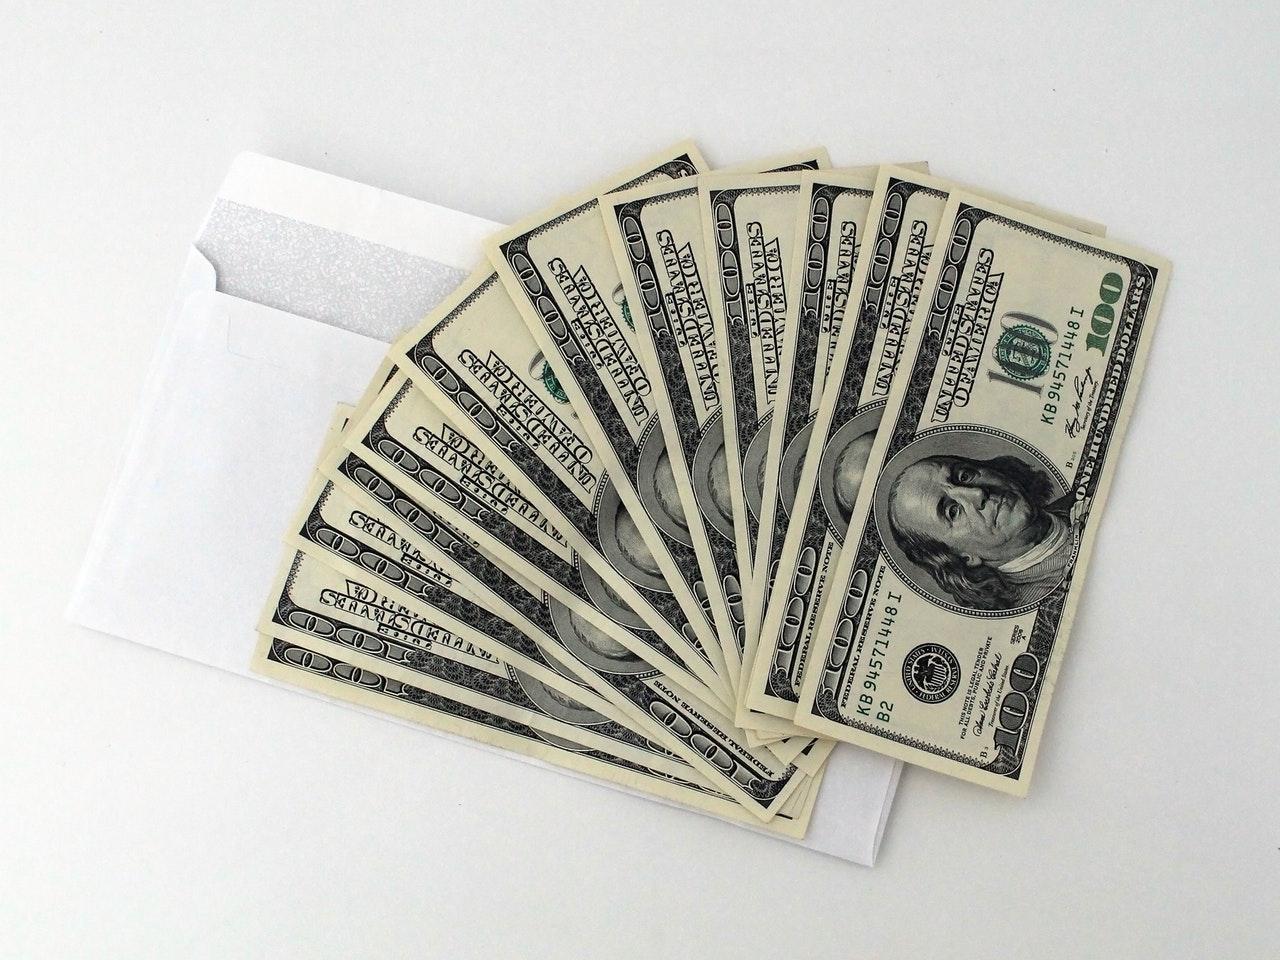 bookies make money